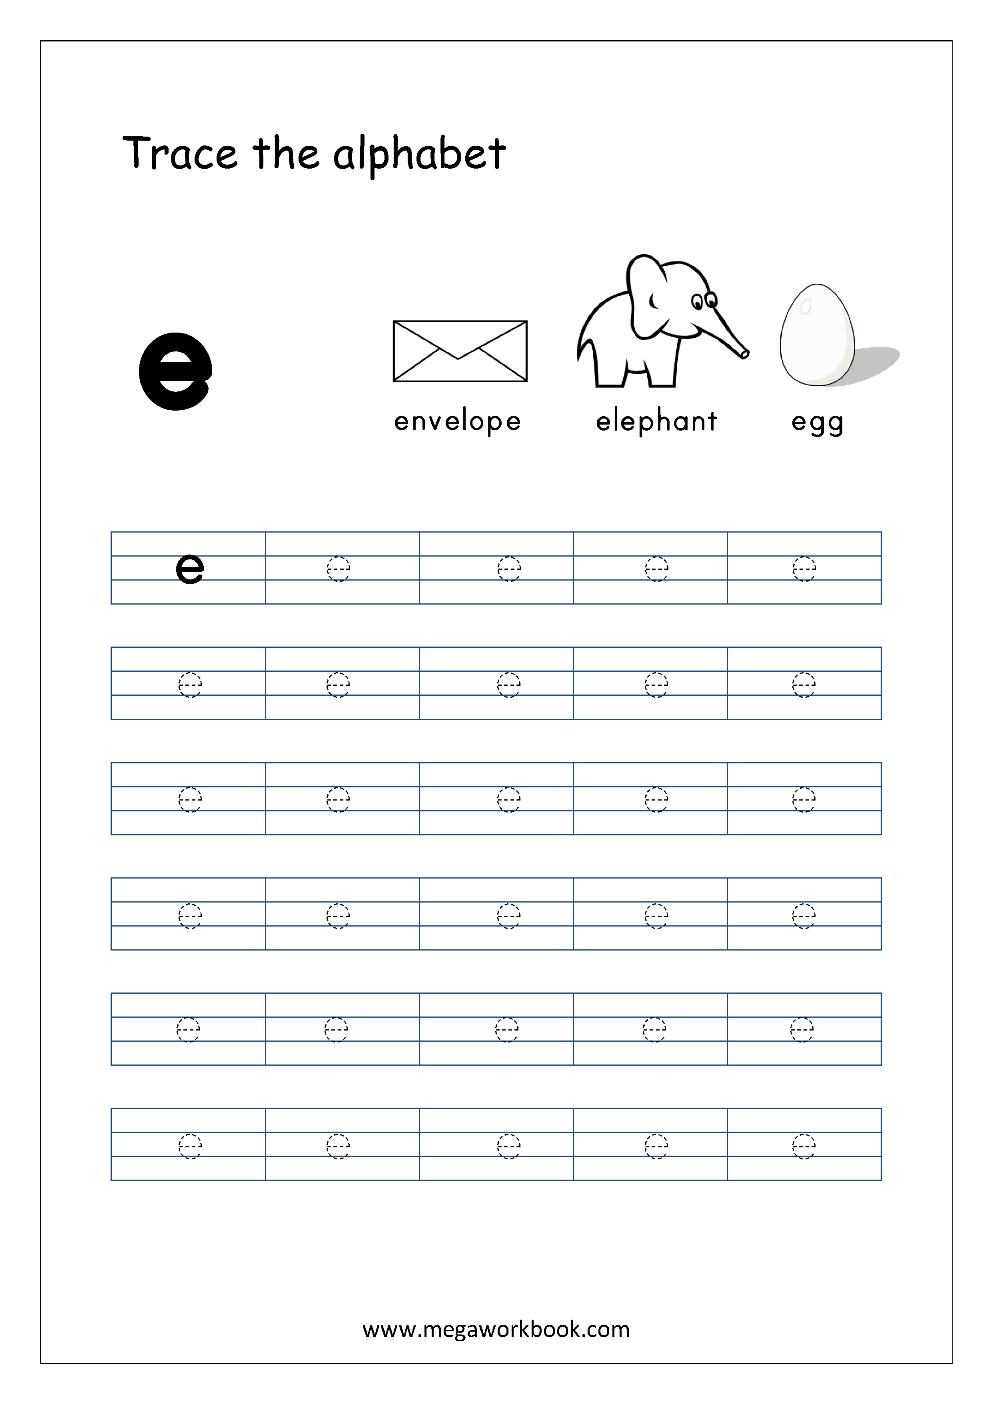 English Worksheet - Alphabet Tracing - Small Letter E intended for Letter E Alphabet Worksheets